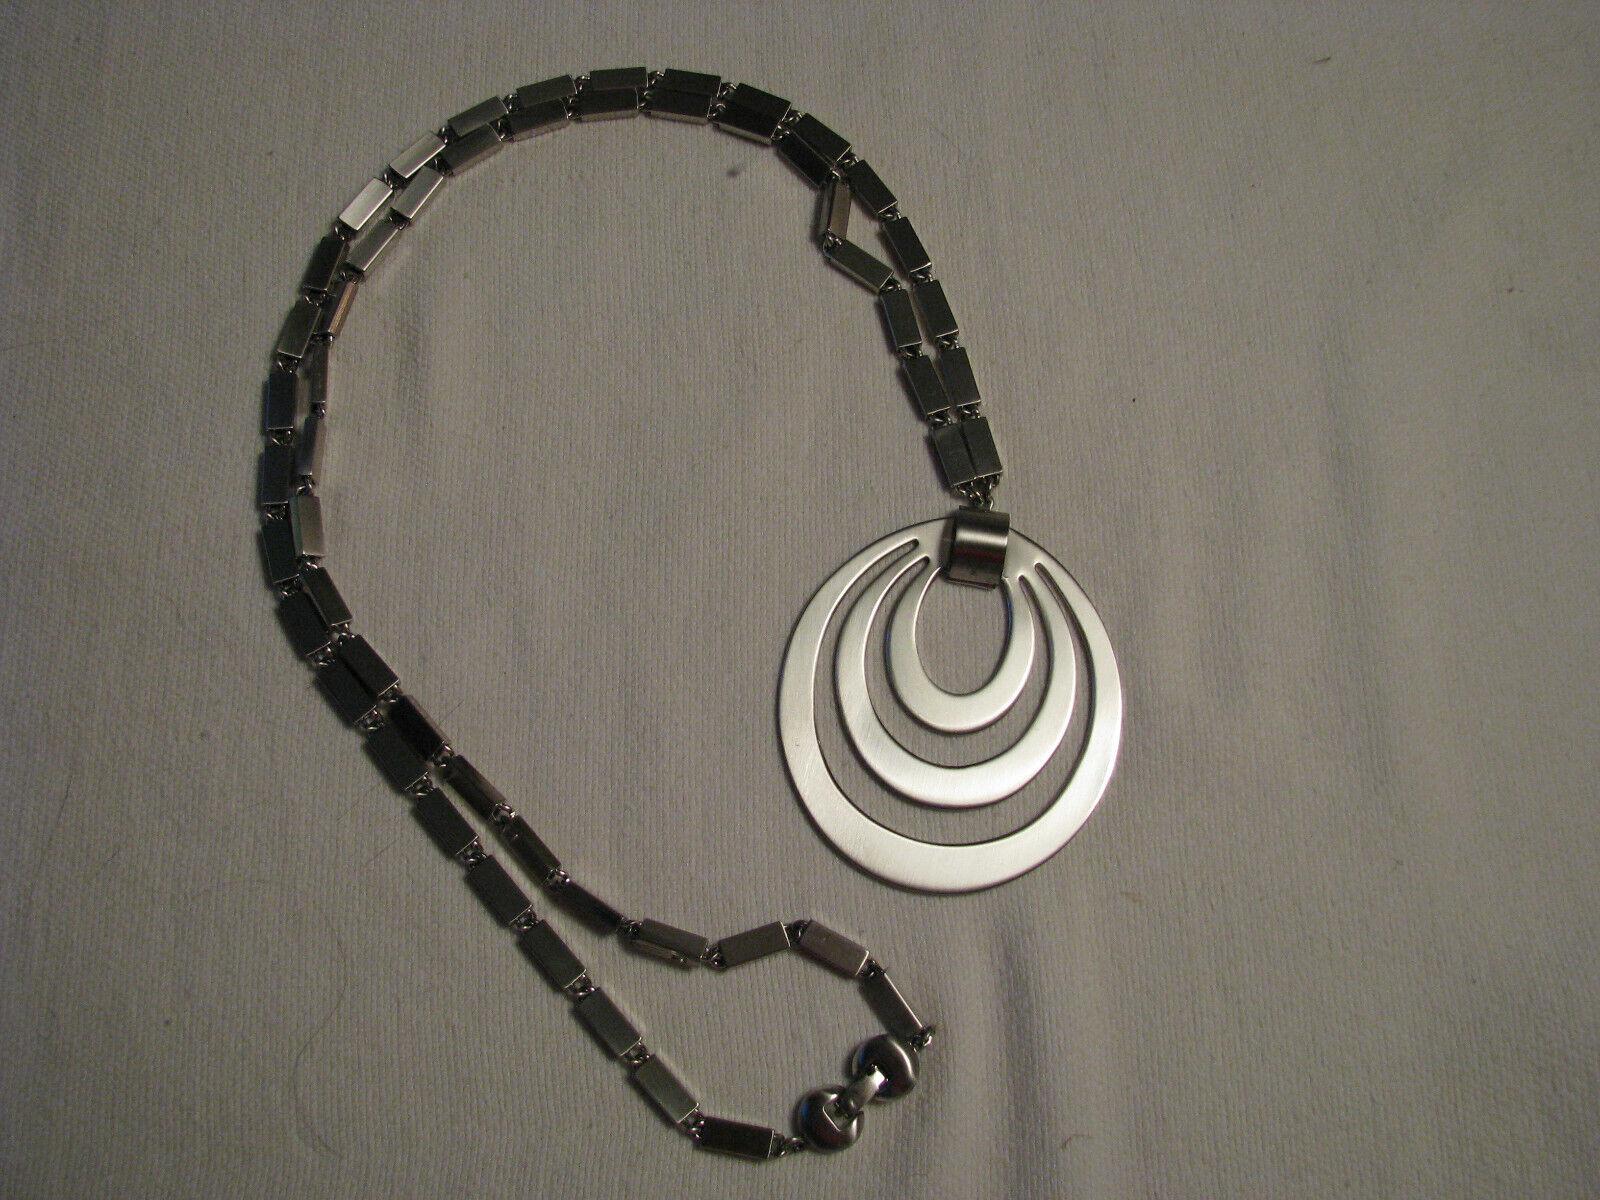 30 MONET silver necklace.